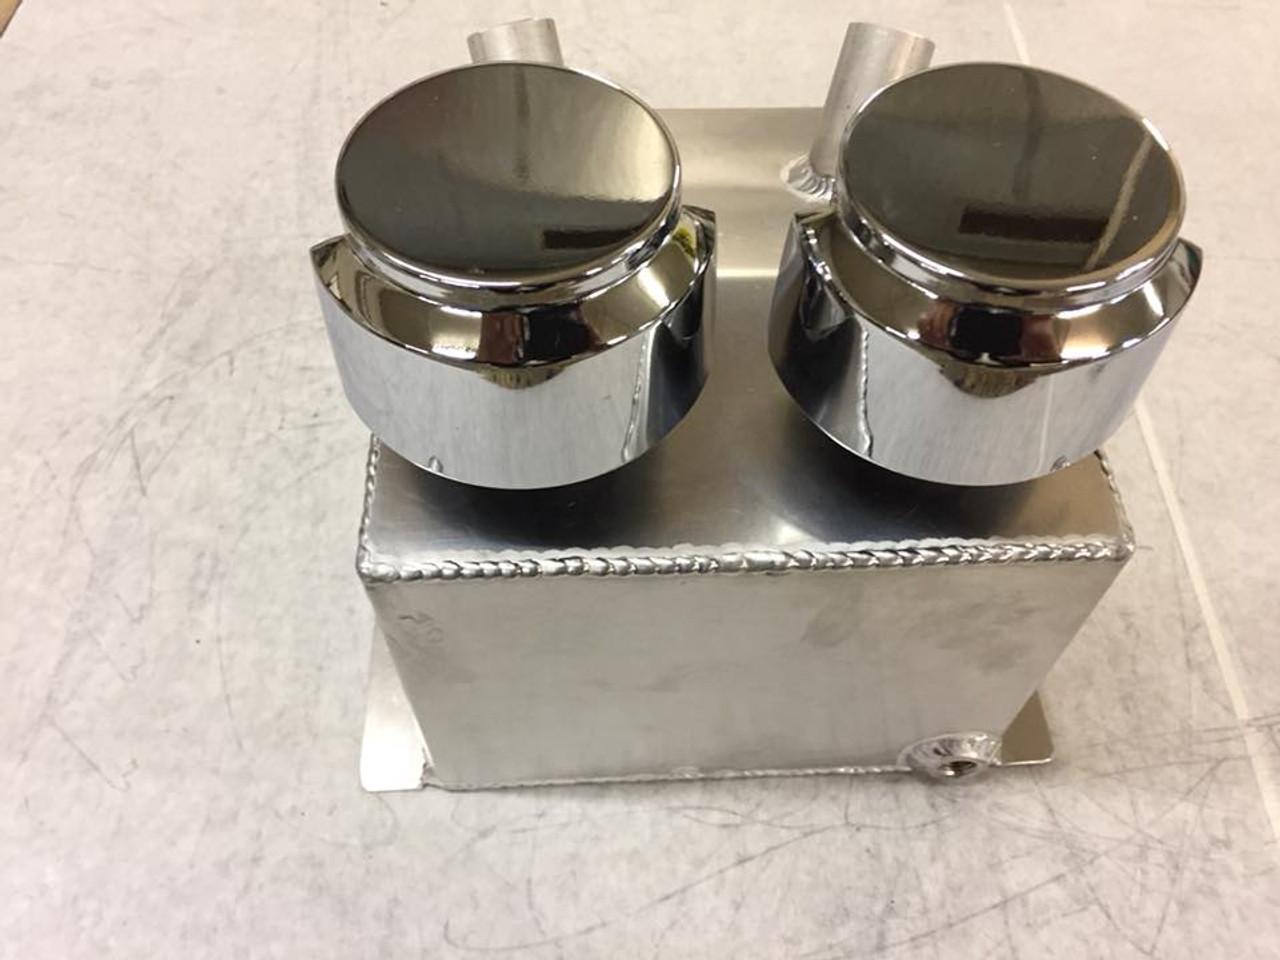 Racecraft Engine Supercharger Breather PUKE Tank, W/Filters, W/Baffles